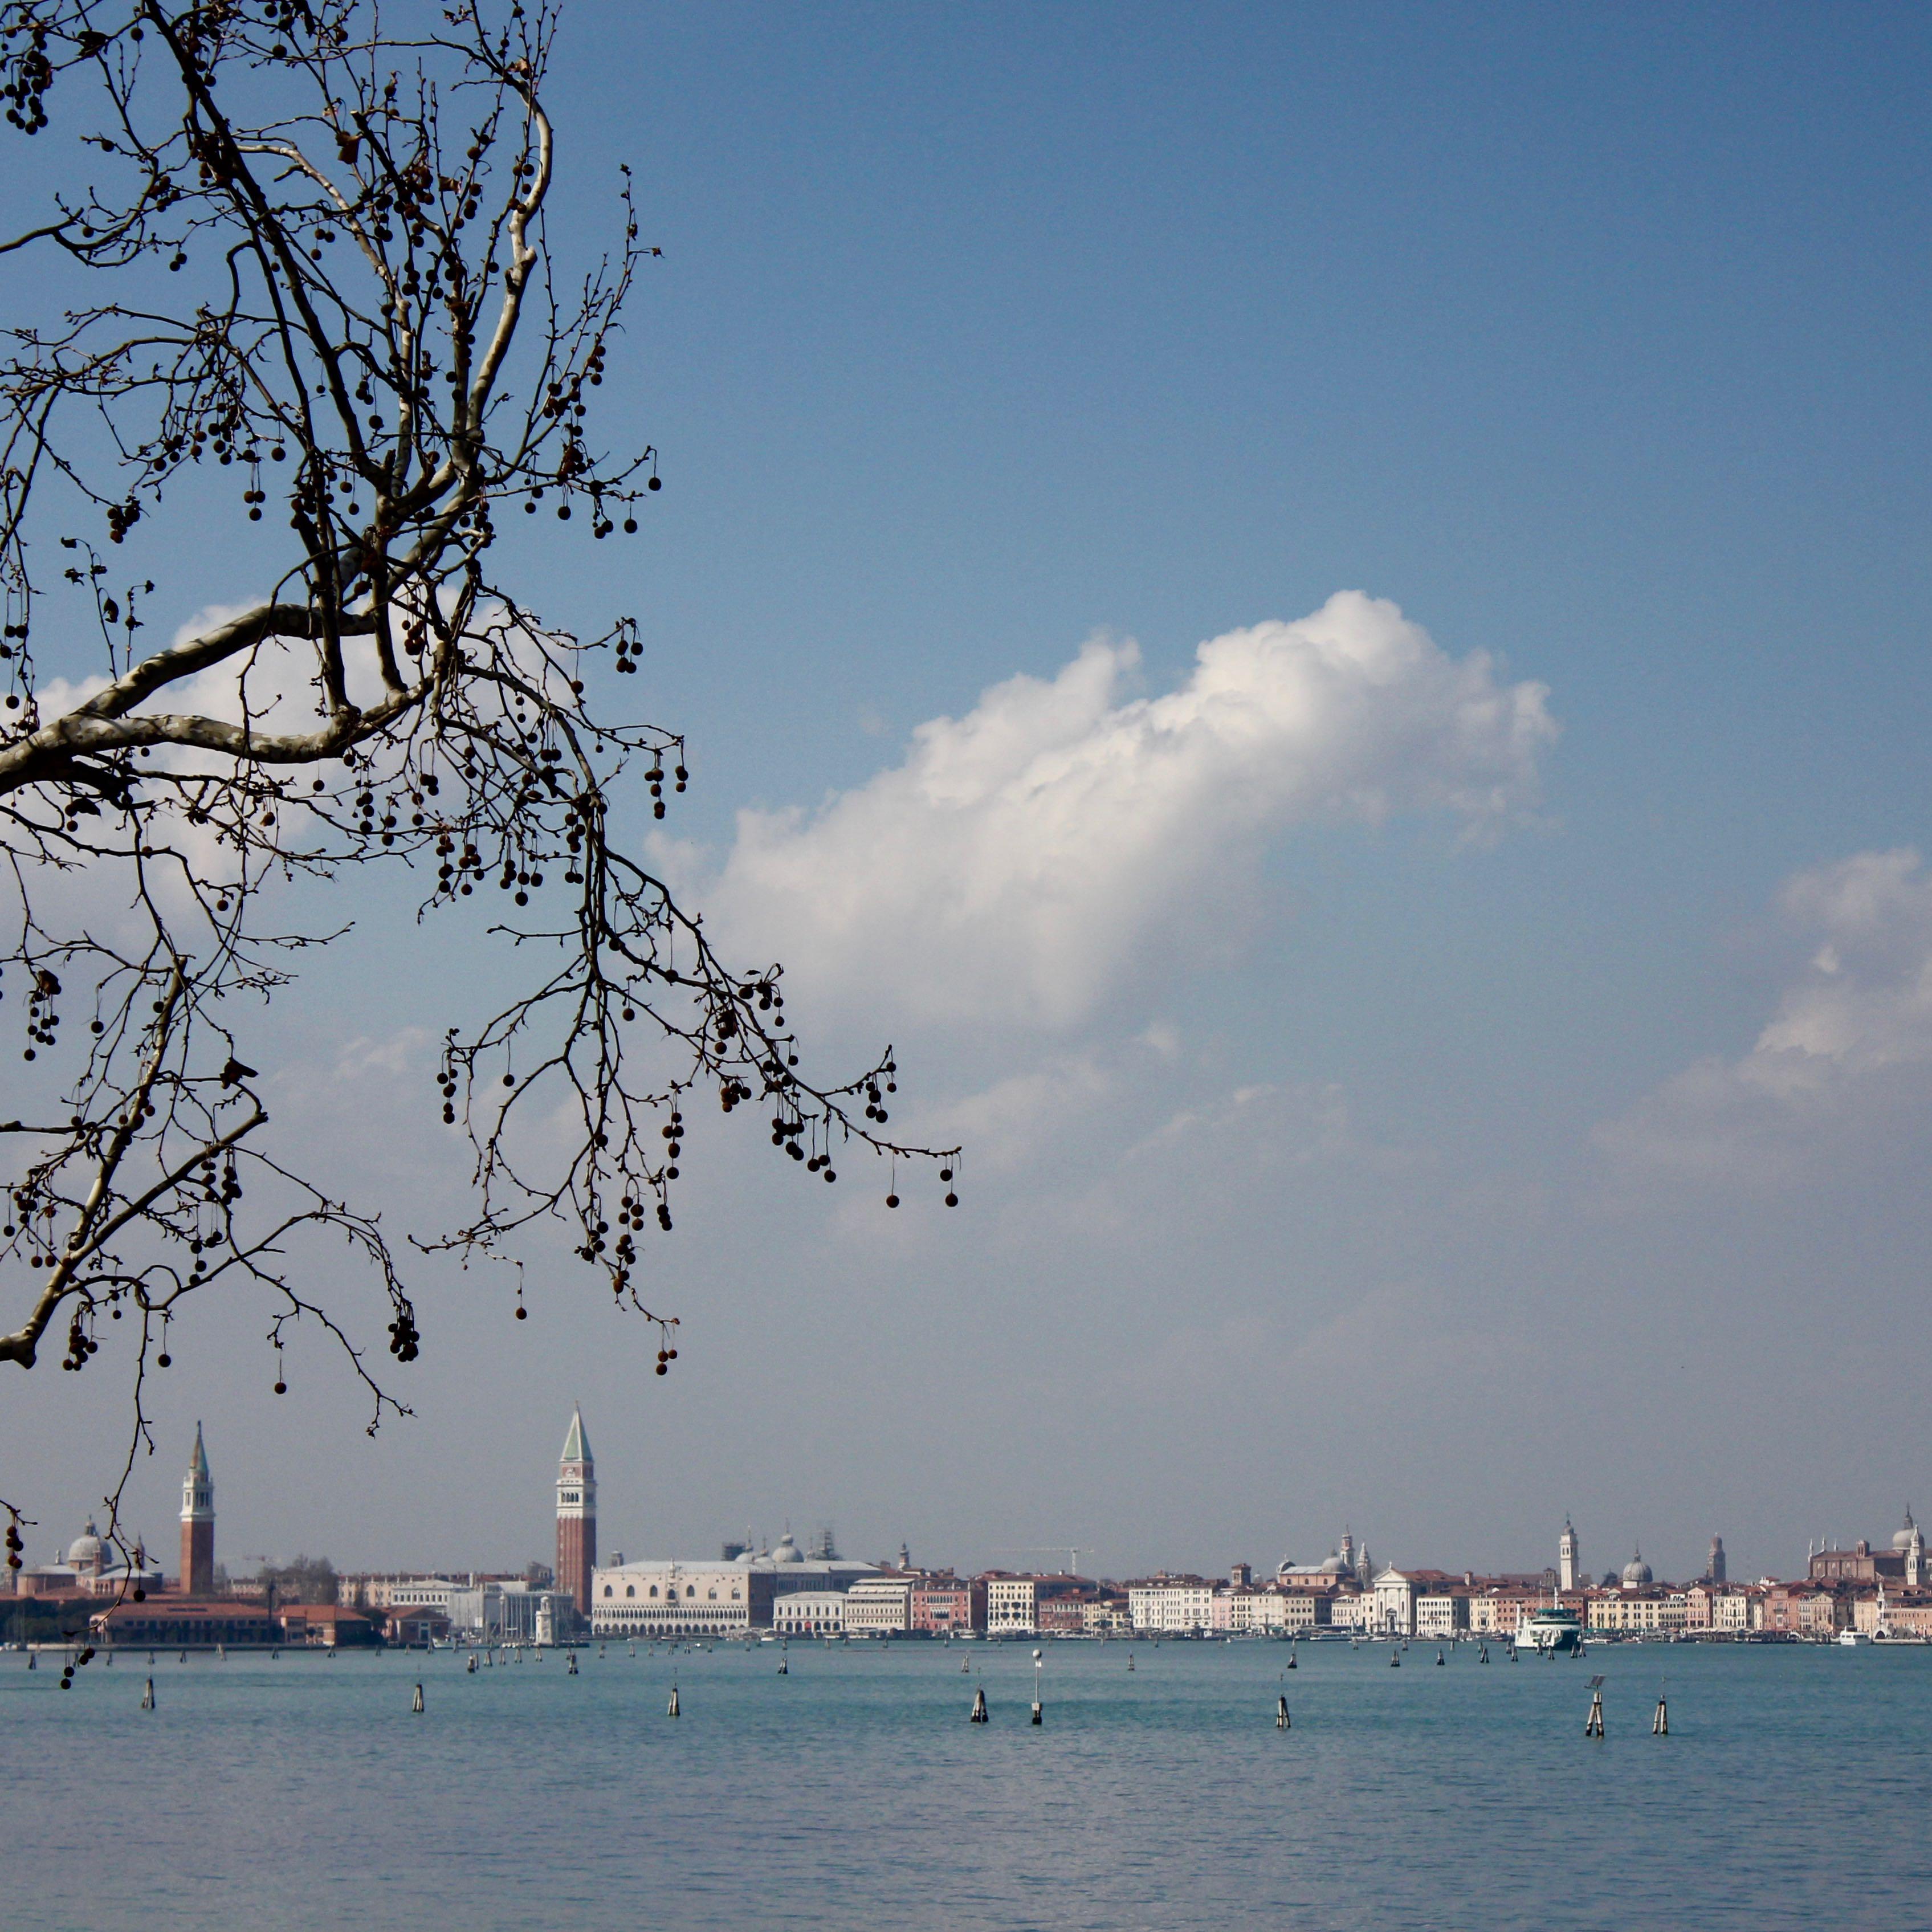 Venezia, Italy10